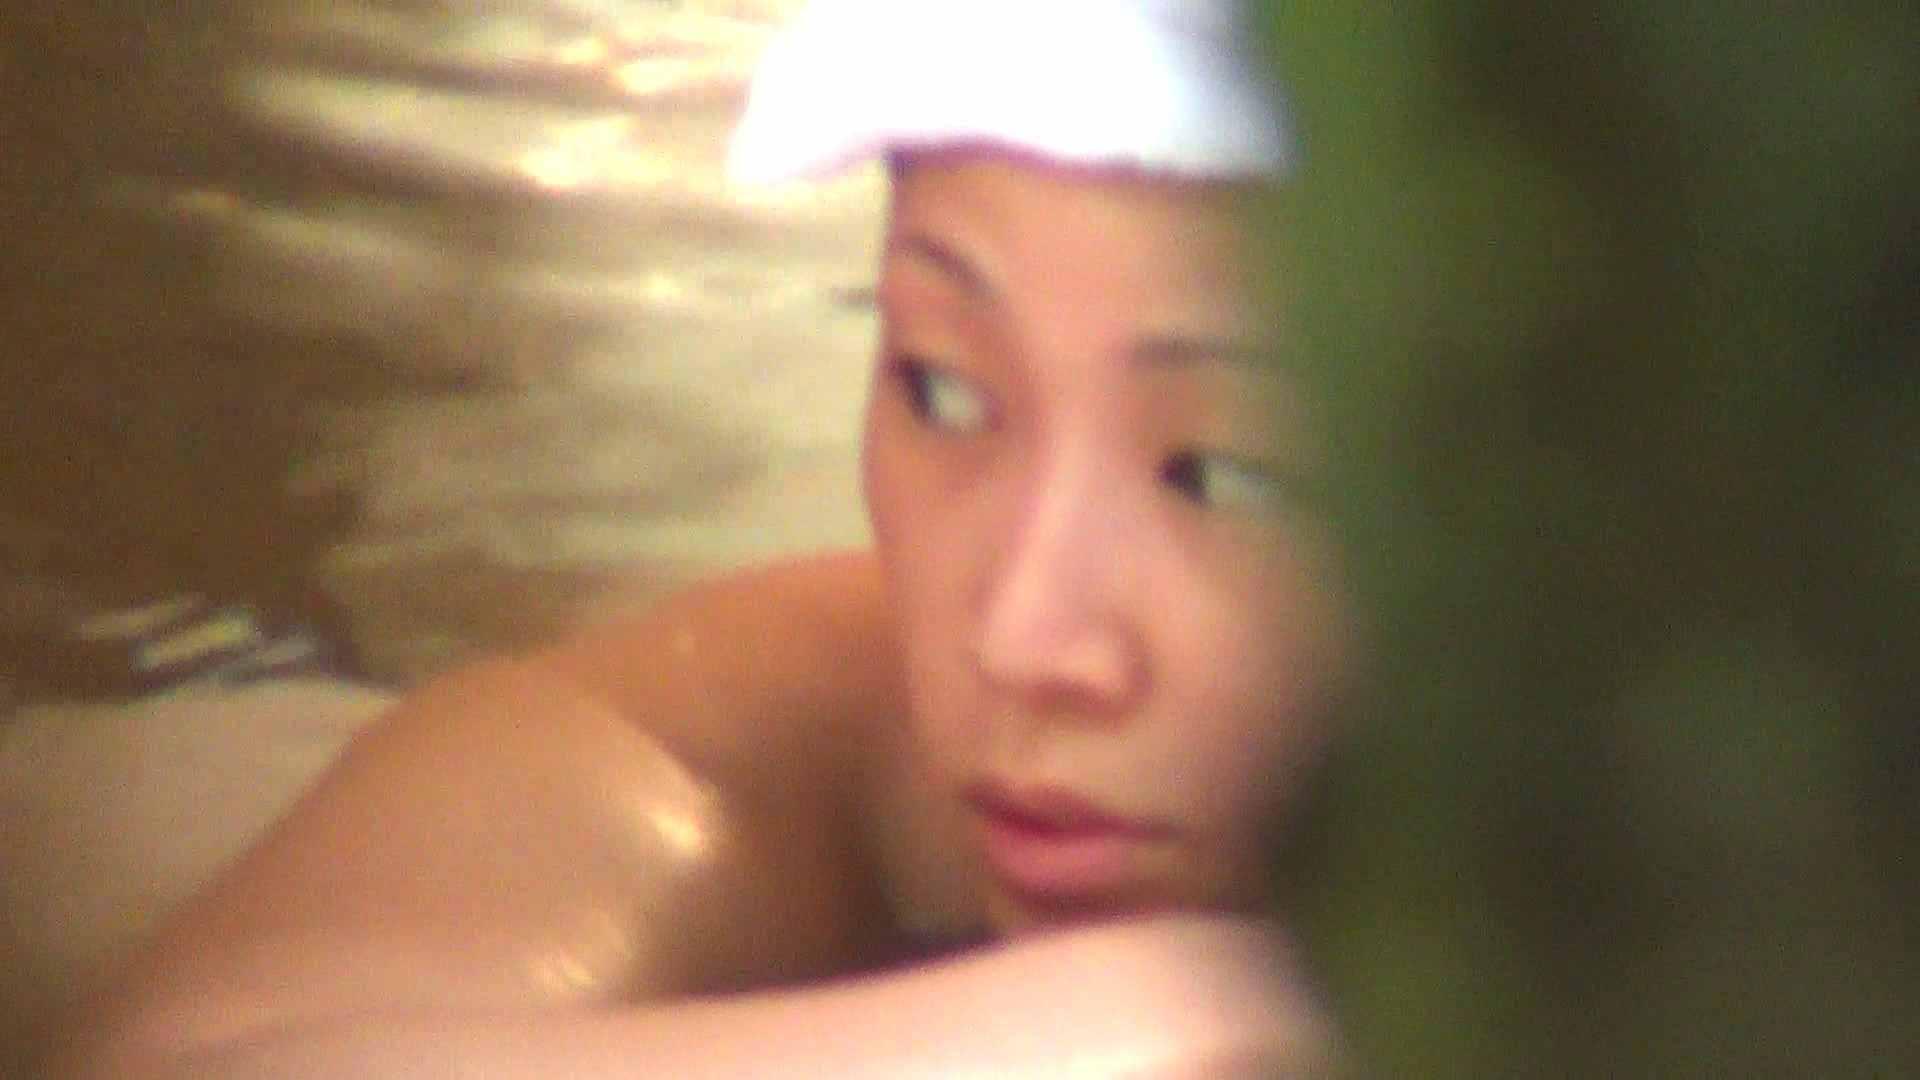 Vol.51 醤油j顔のお女市さん 胸の割りに下半身はがっちりタイプ OL | 美女達のヌード  95連発 33